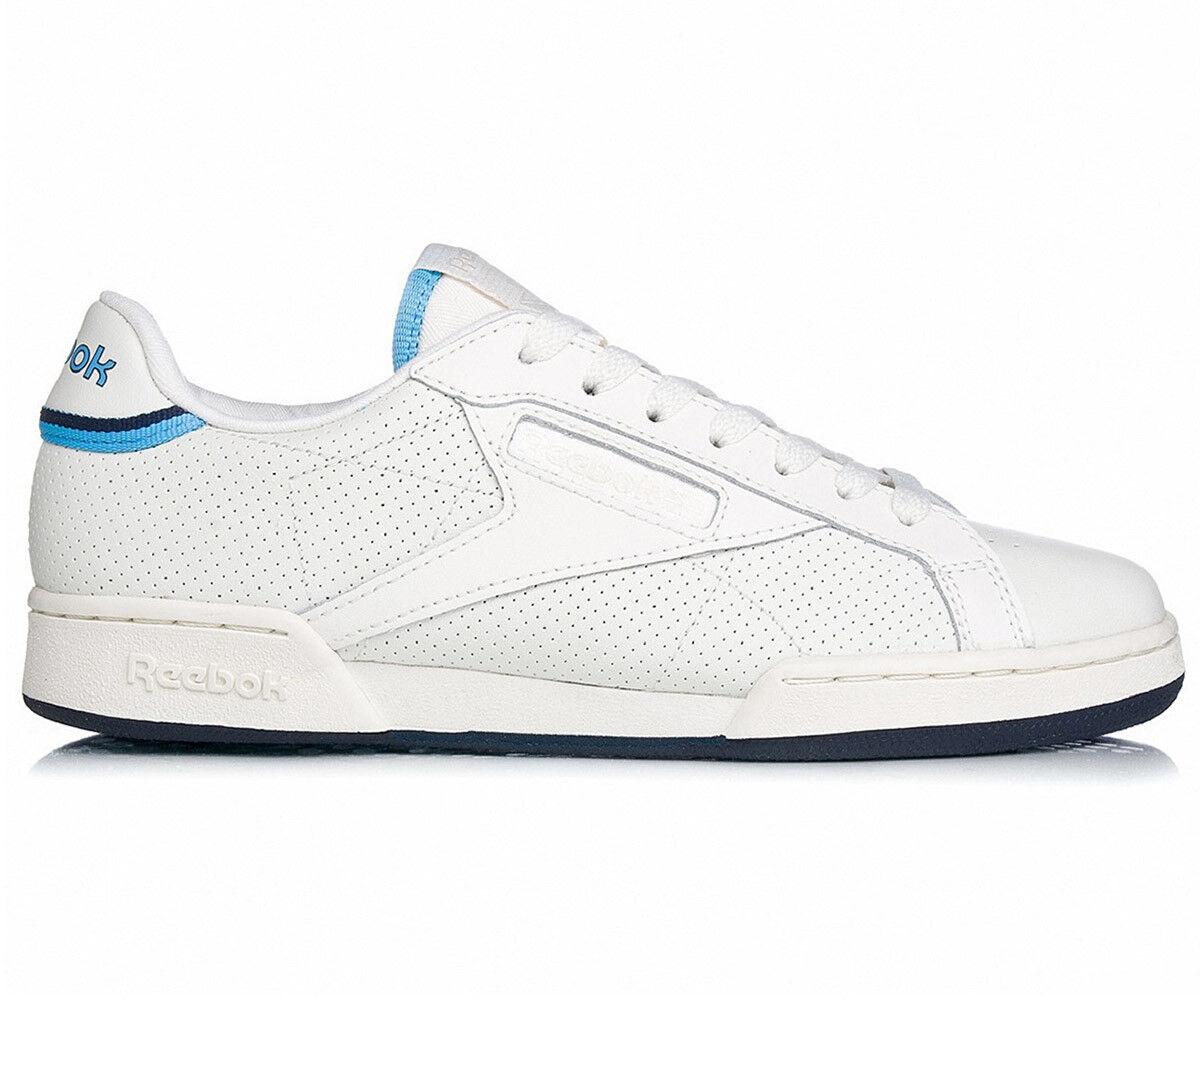 Reebok Classic NPC UK II Schuhe Thof Leder Herren Sneaker Schuhe II Weiß Leder BD2884 f8f4e6